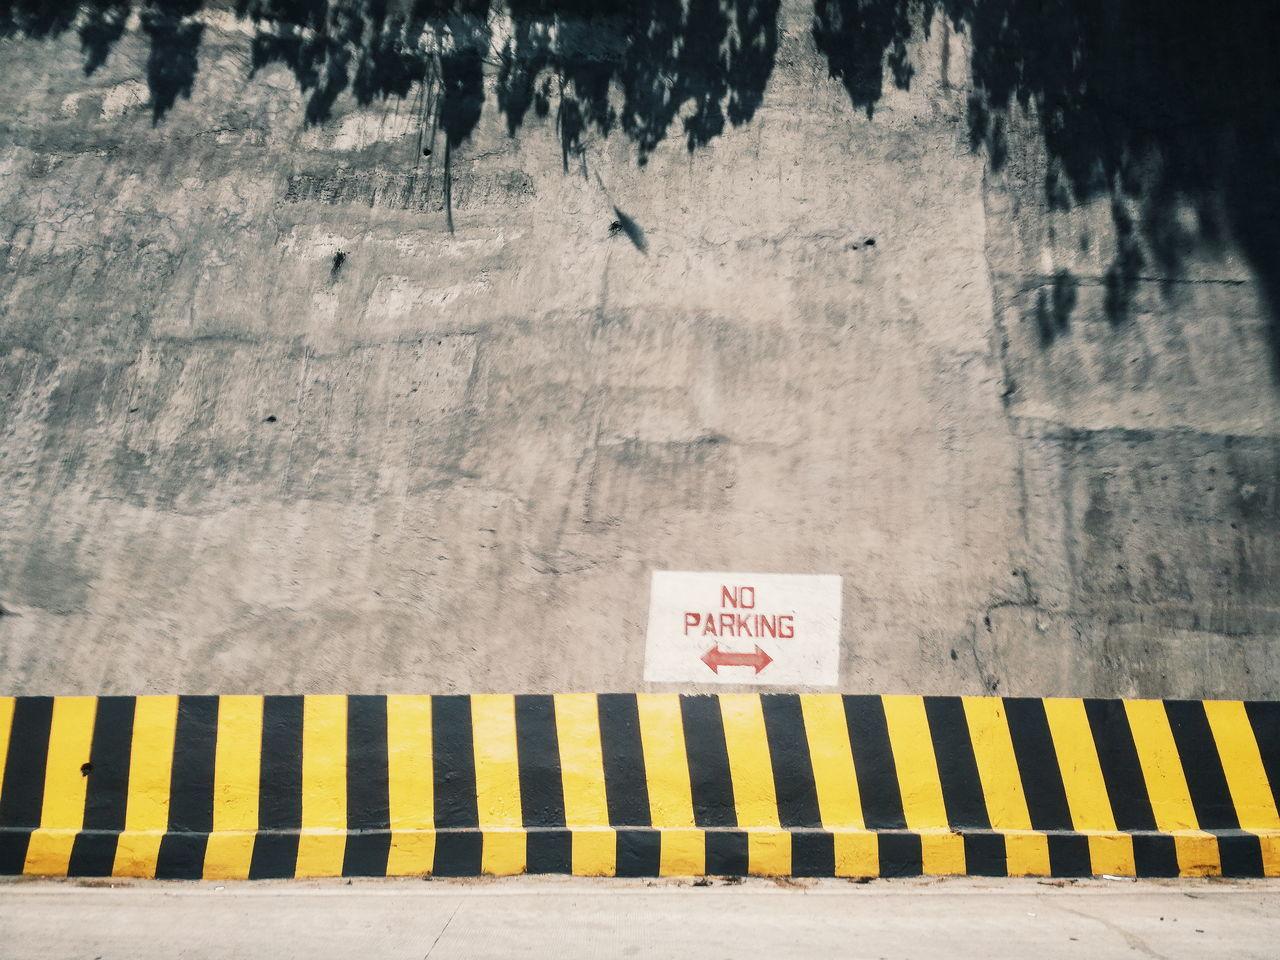 No parking Outdoors Text No Parking Street Sign